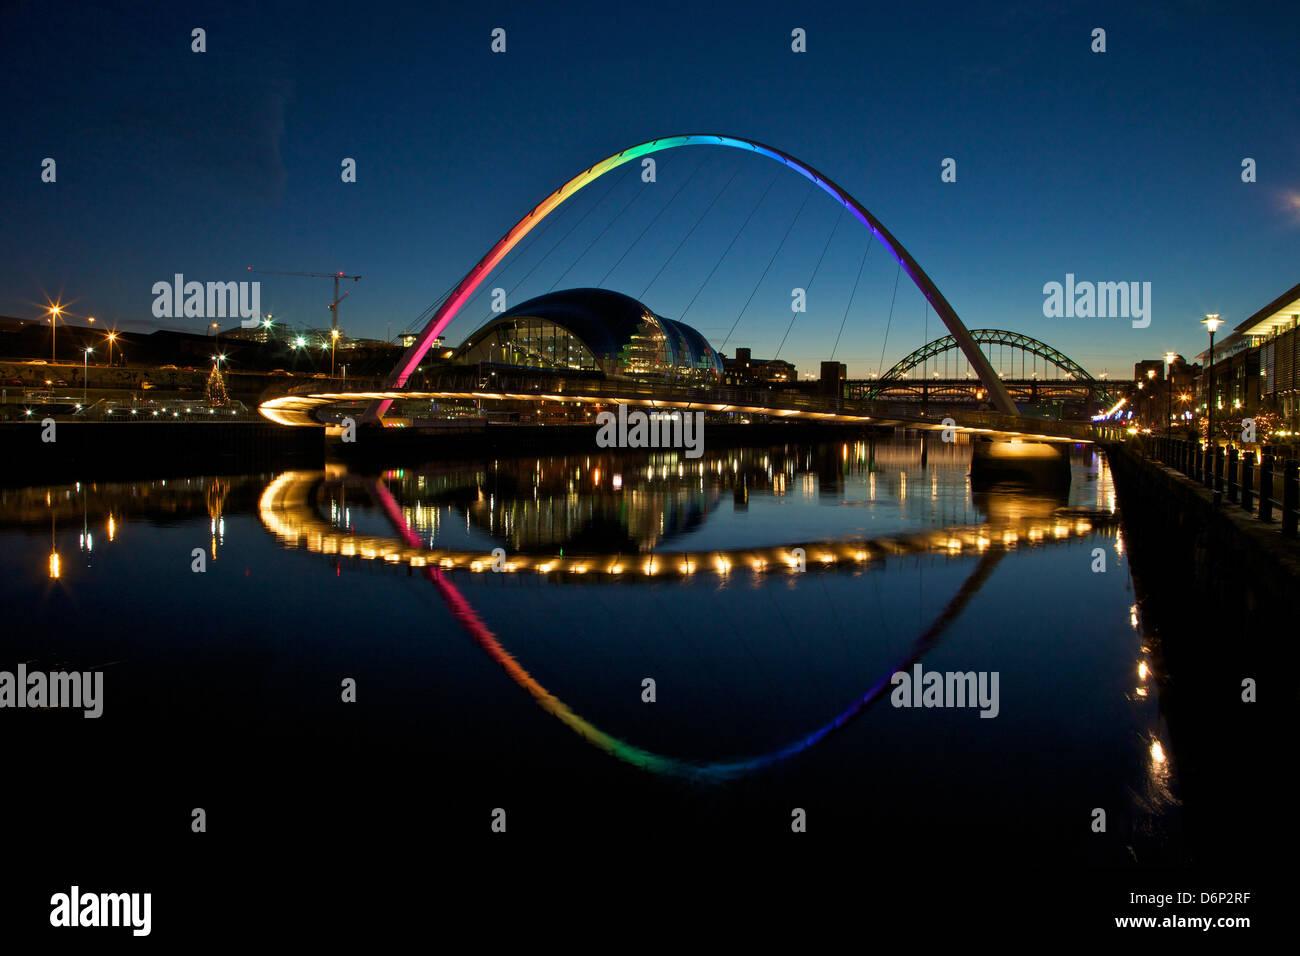 Gateshead Quays with Sage Gateshead and Millennium Bridge at night, Tyne and Wear, England, United Kingdom, Europe - Stock Image